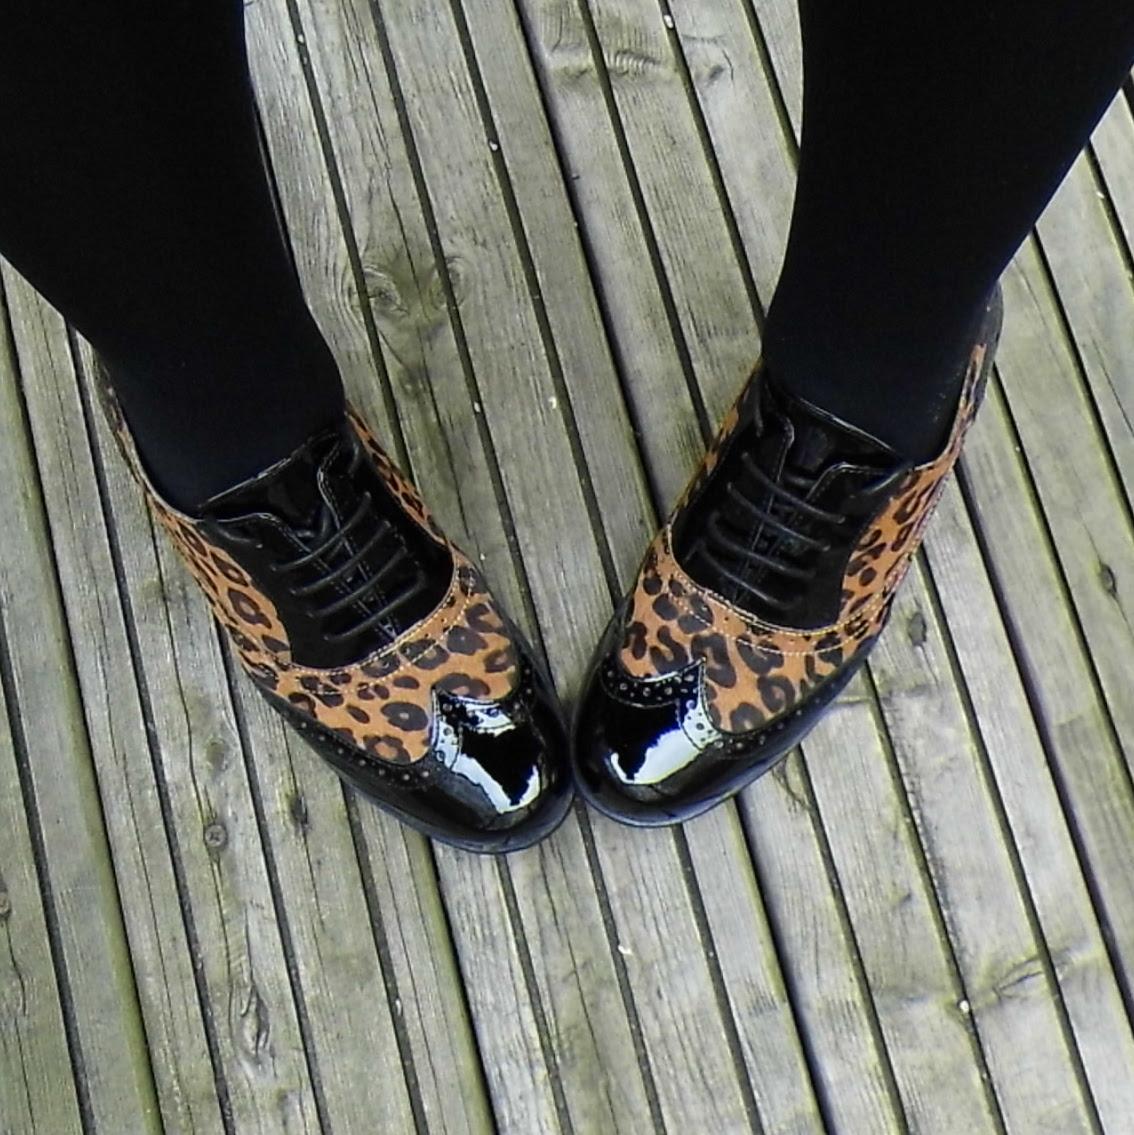 Clarks Hamble Oak Brogues shoes